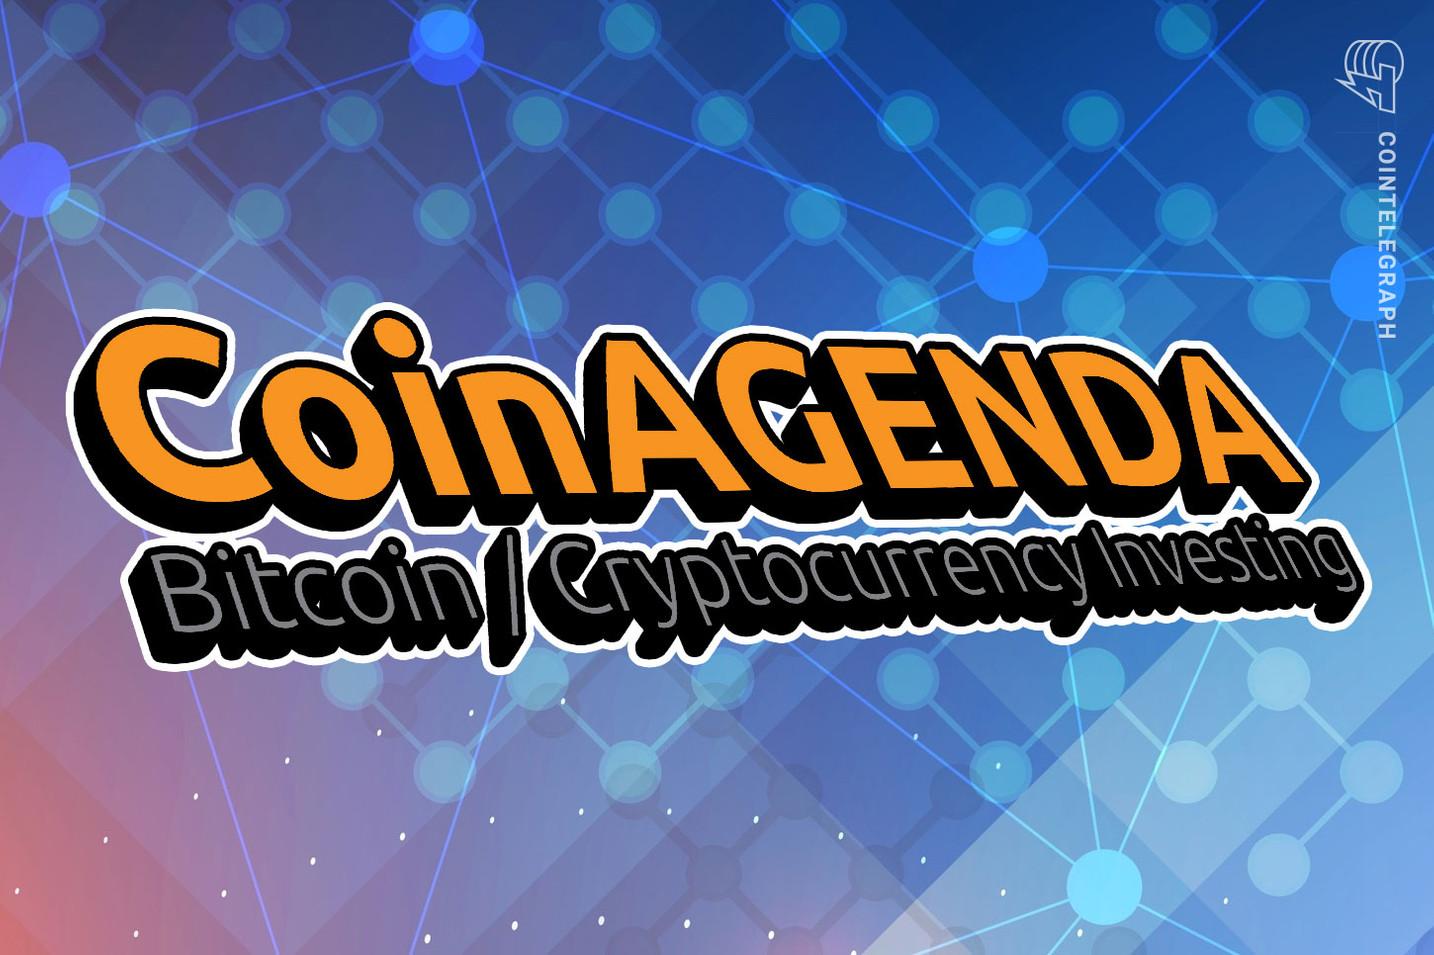 CoinAgenda hosts crypto investor virtual event on Oct 28-29